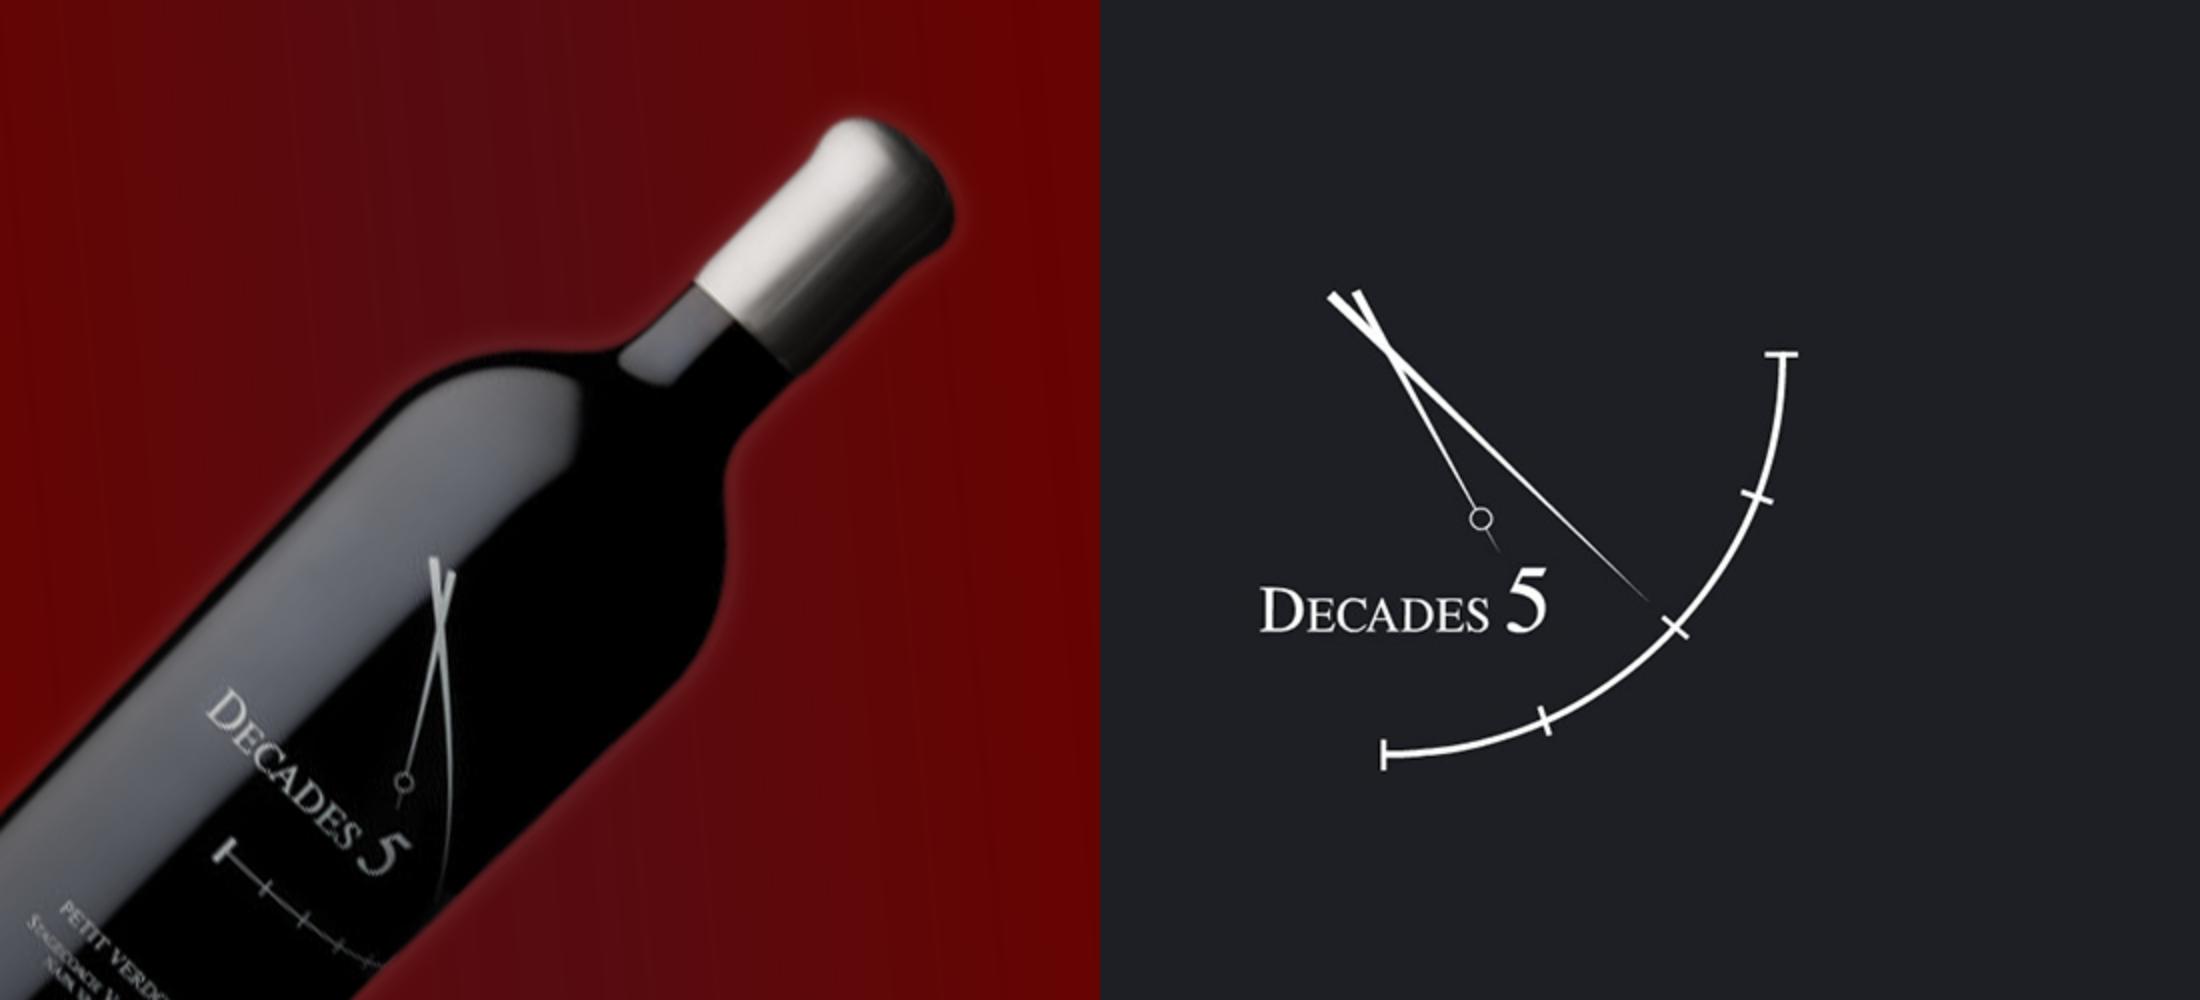 Decades 5 Petit Verdot